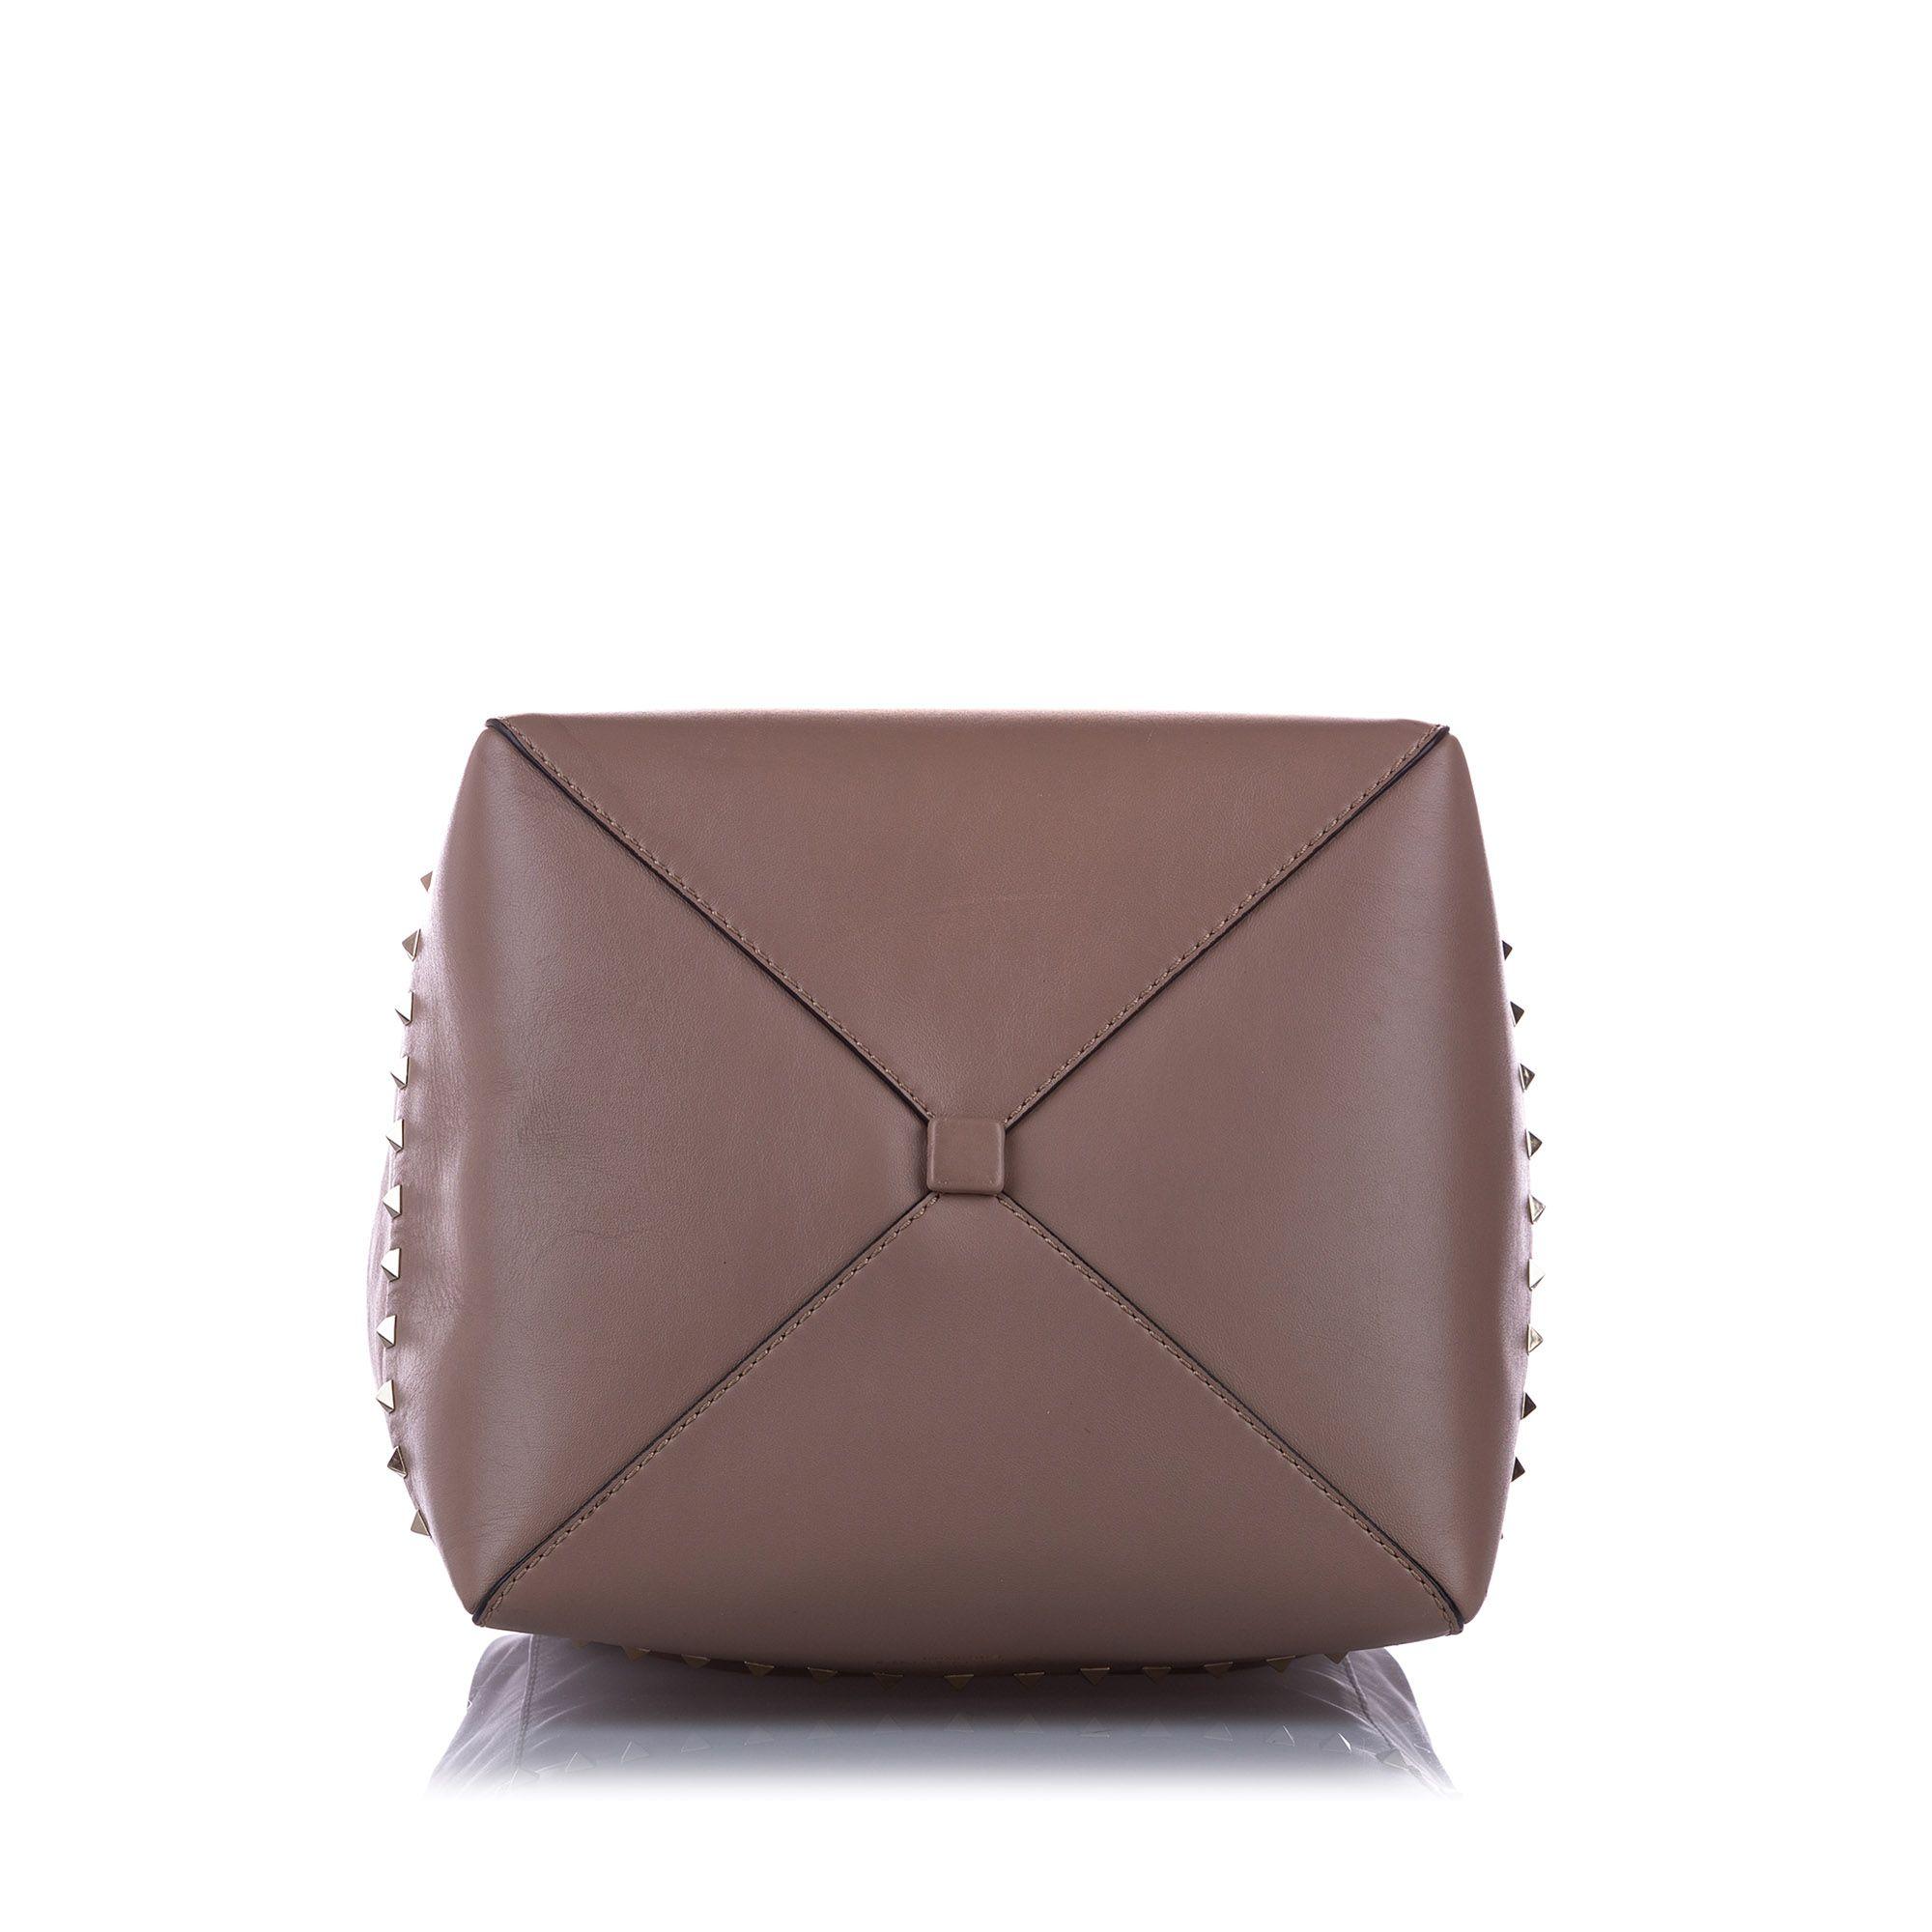 Vintage Valentino Rockstud Leather Satchel Brown